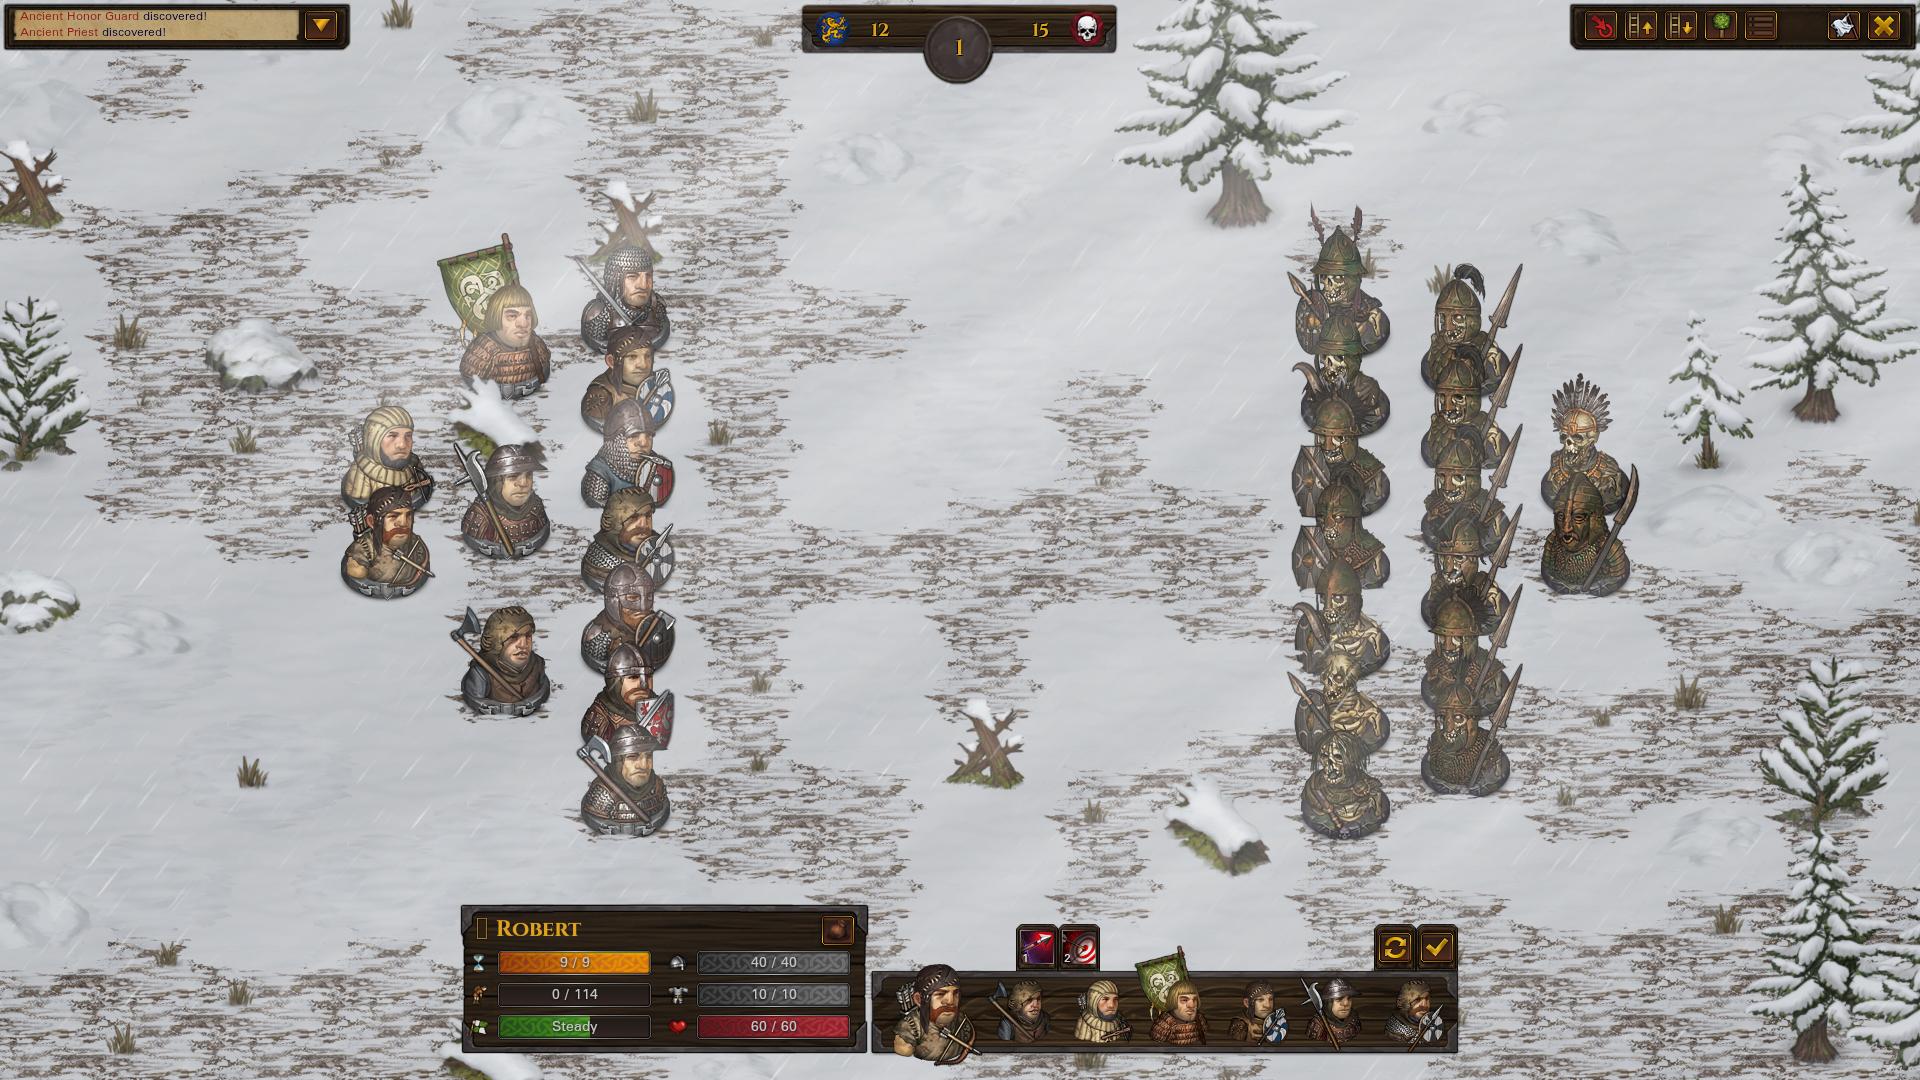 Battle Brothers - unikalna turowa strategia z RPG